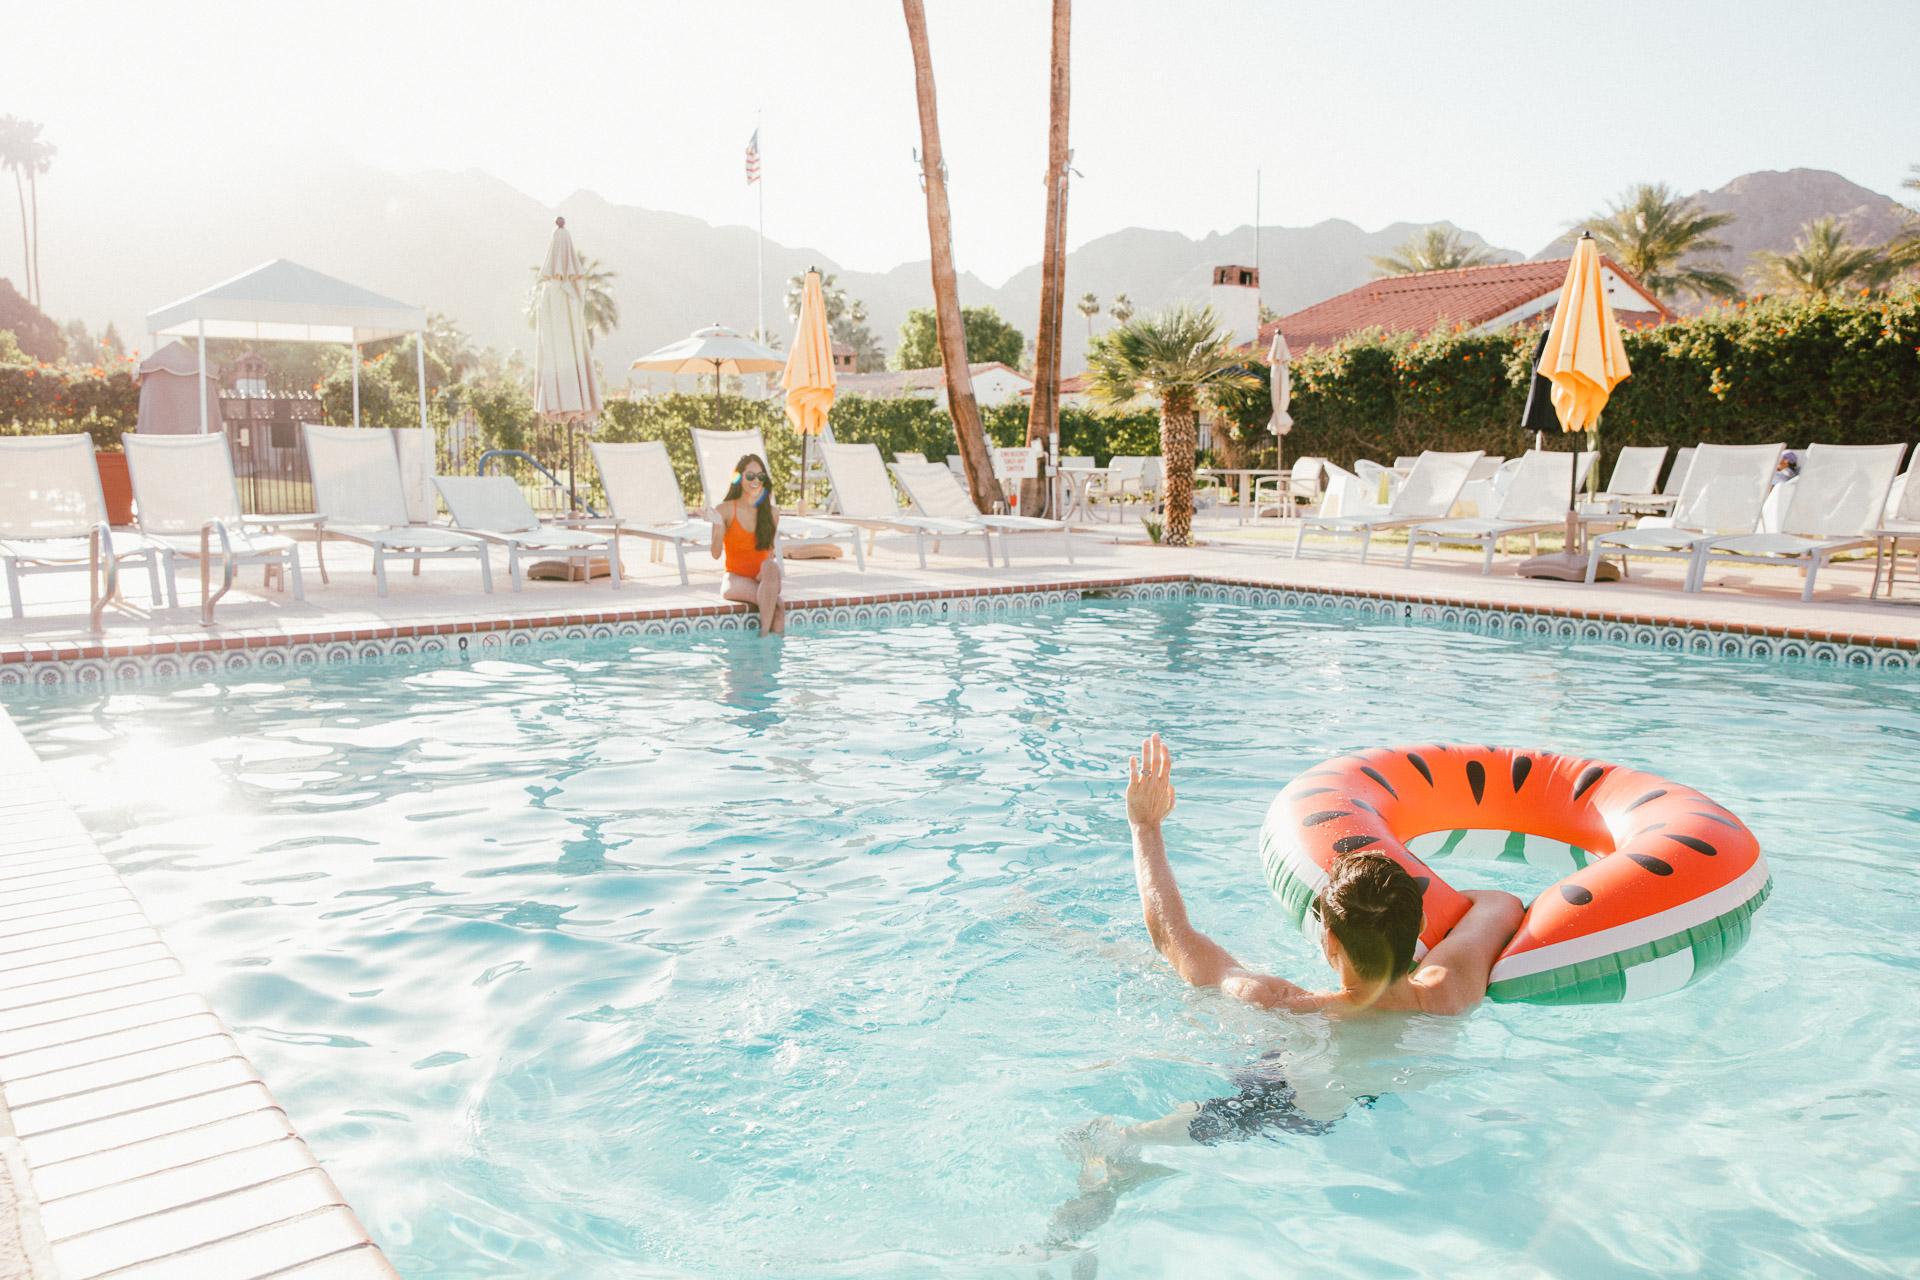 palm-springs-california-hotel-lifestyle-photographer-la-quinta-resort-club-29.jpg